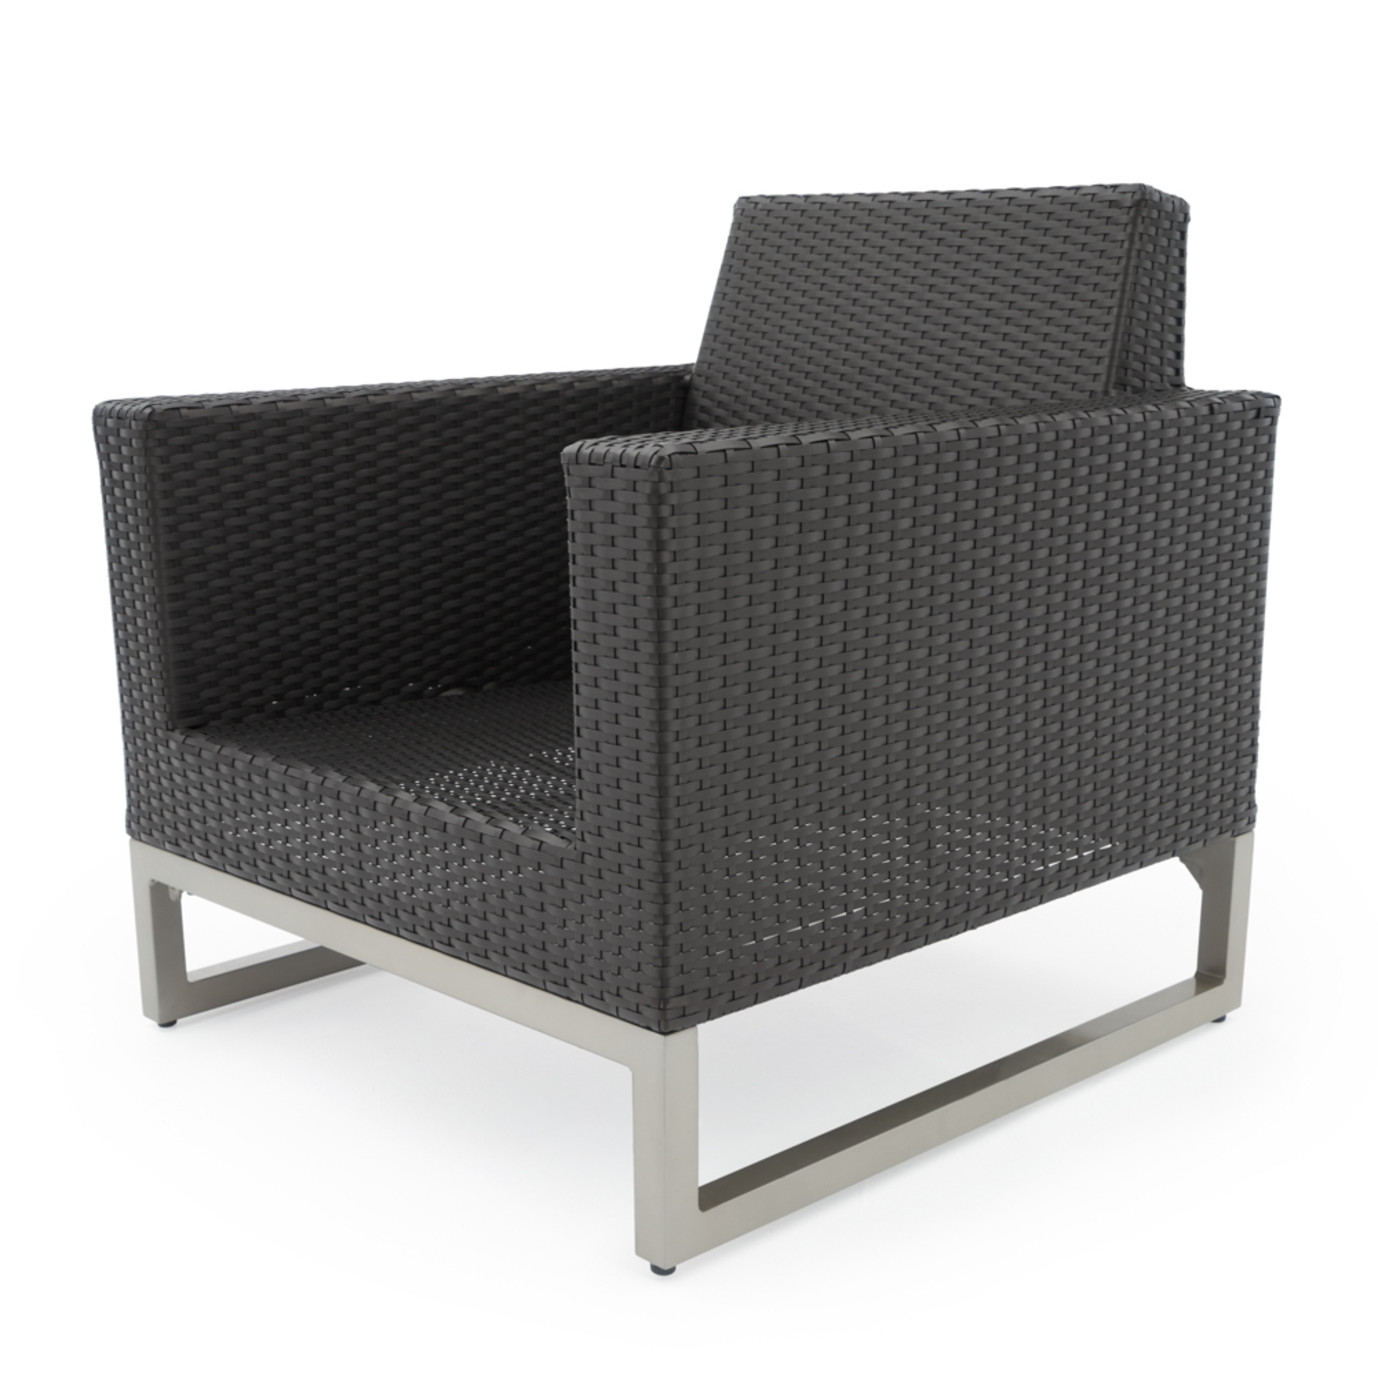 Milo™ Espresso 7pc Deep Seating Set -Navy Blue